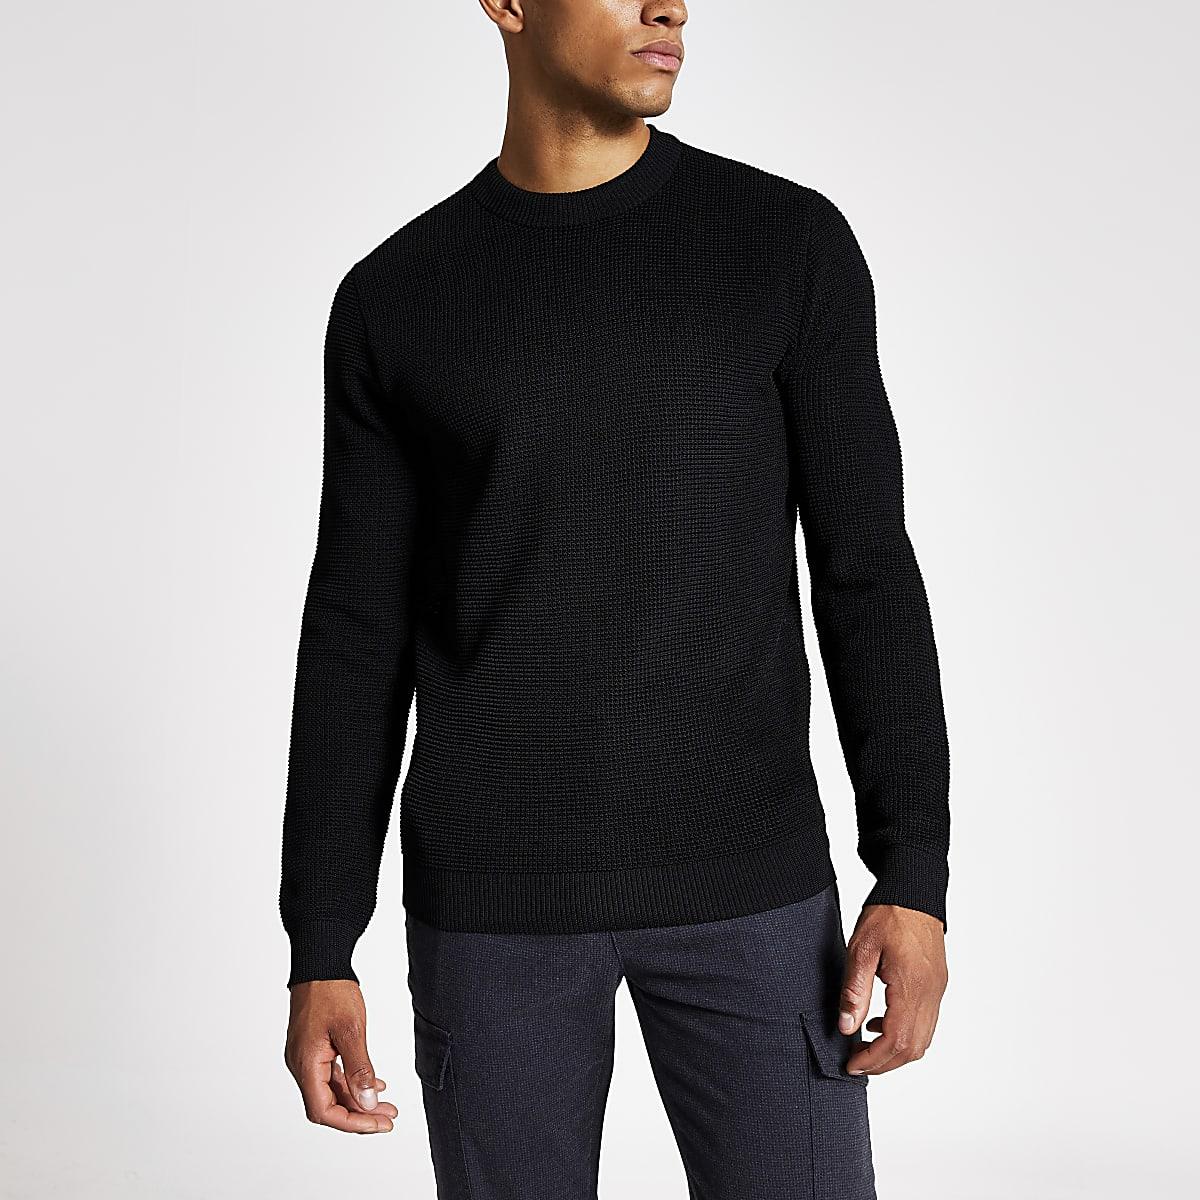 Black long sleeve knitted slim fit jumper